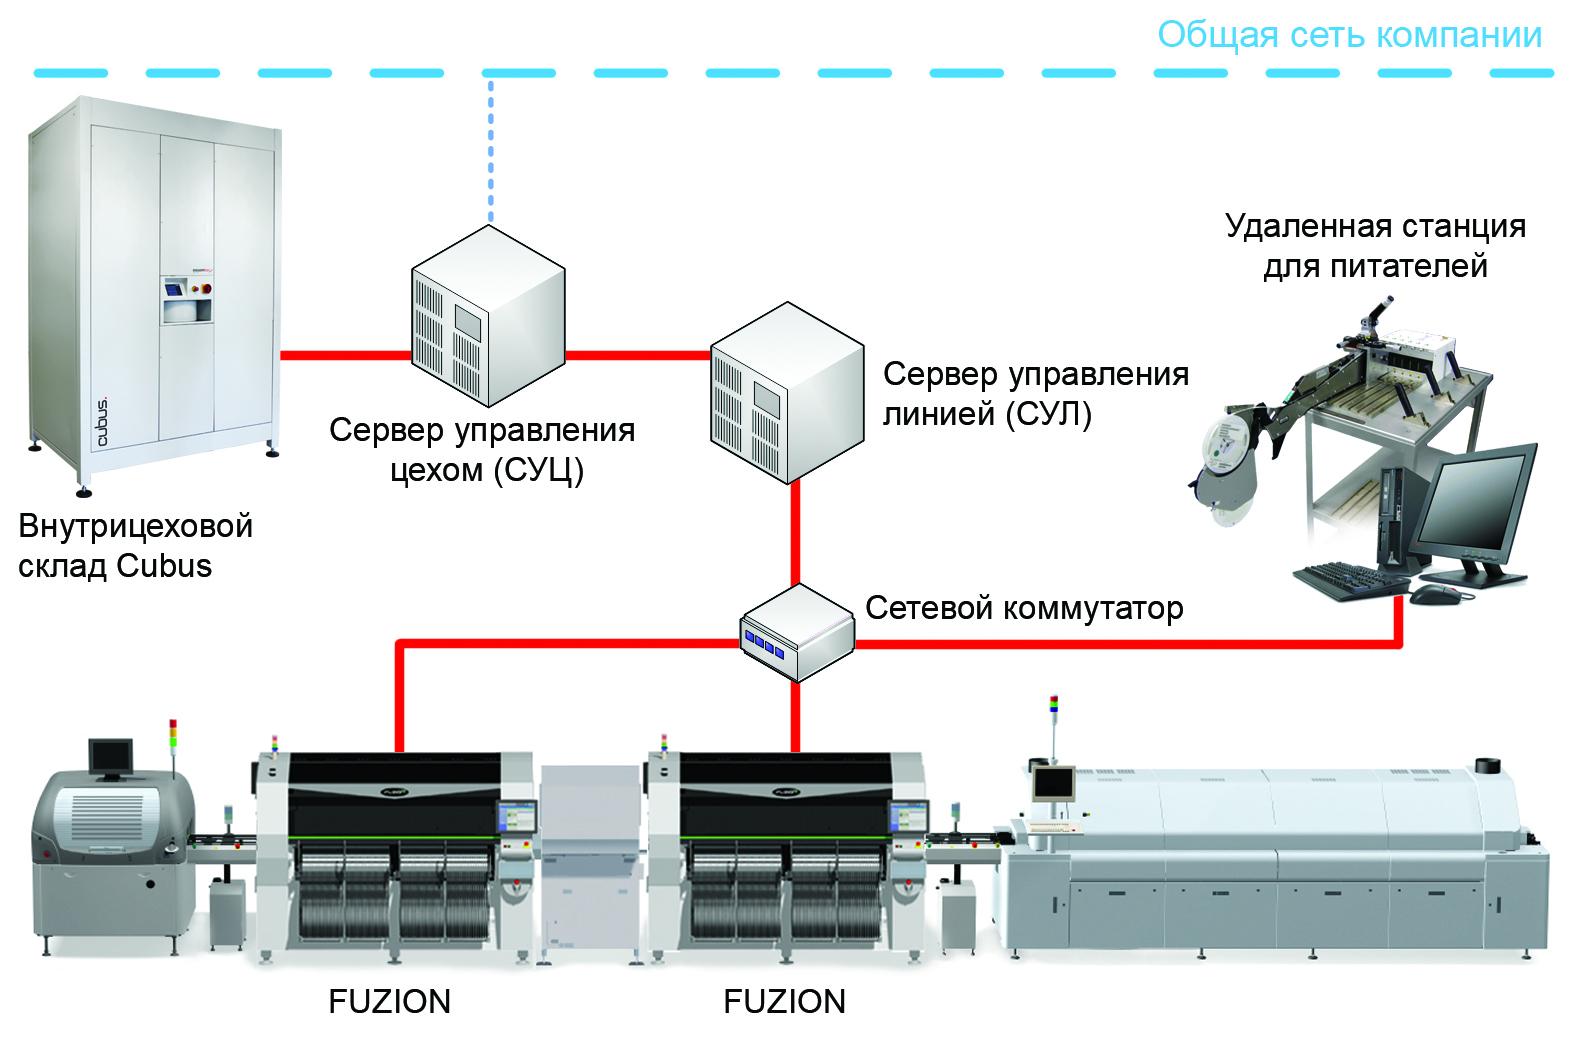 fuzion-line-control-server.jpg